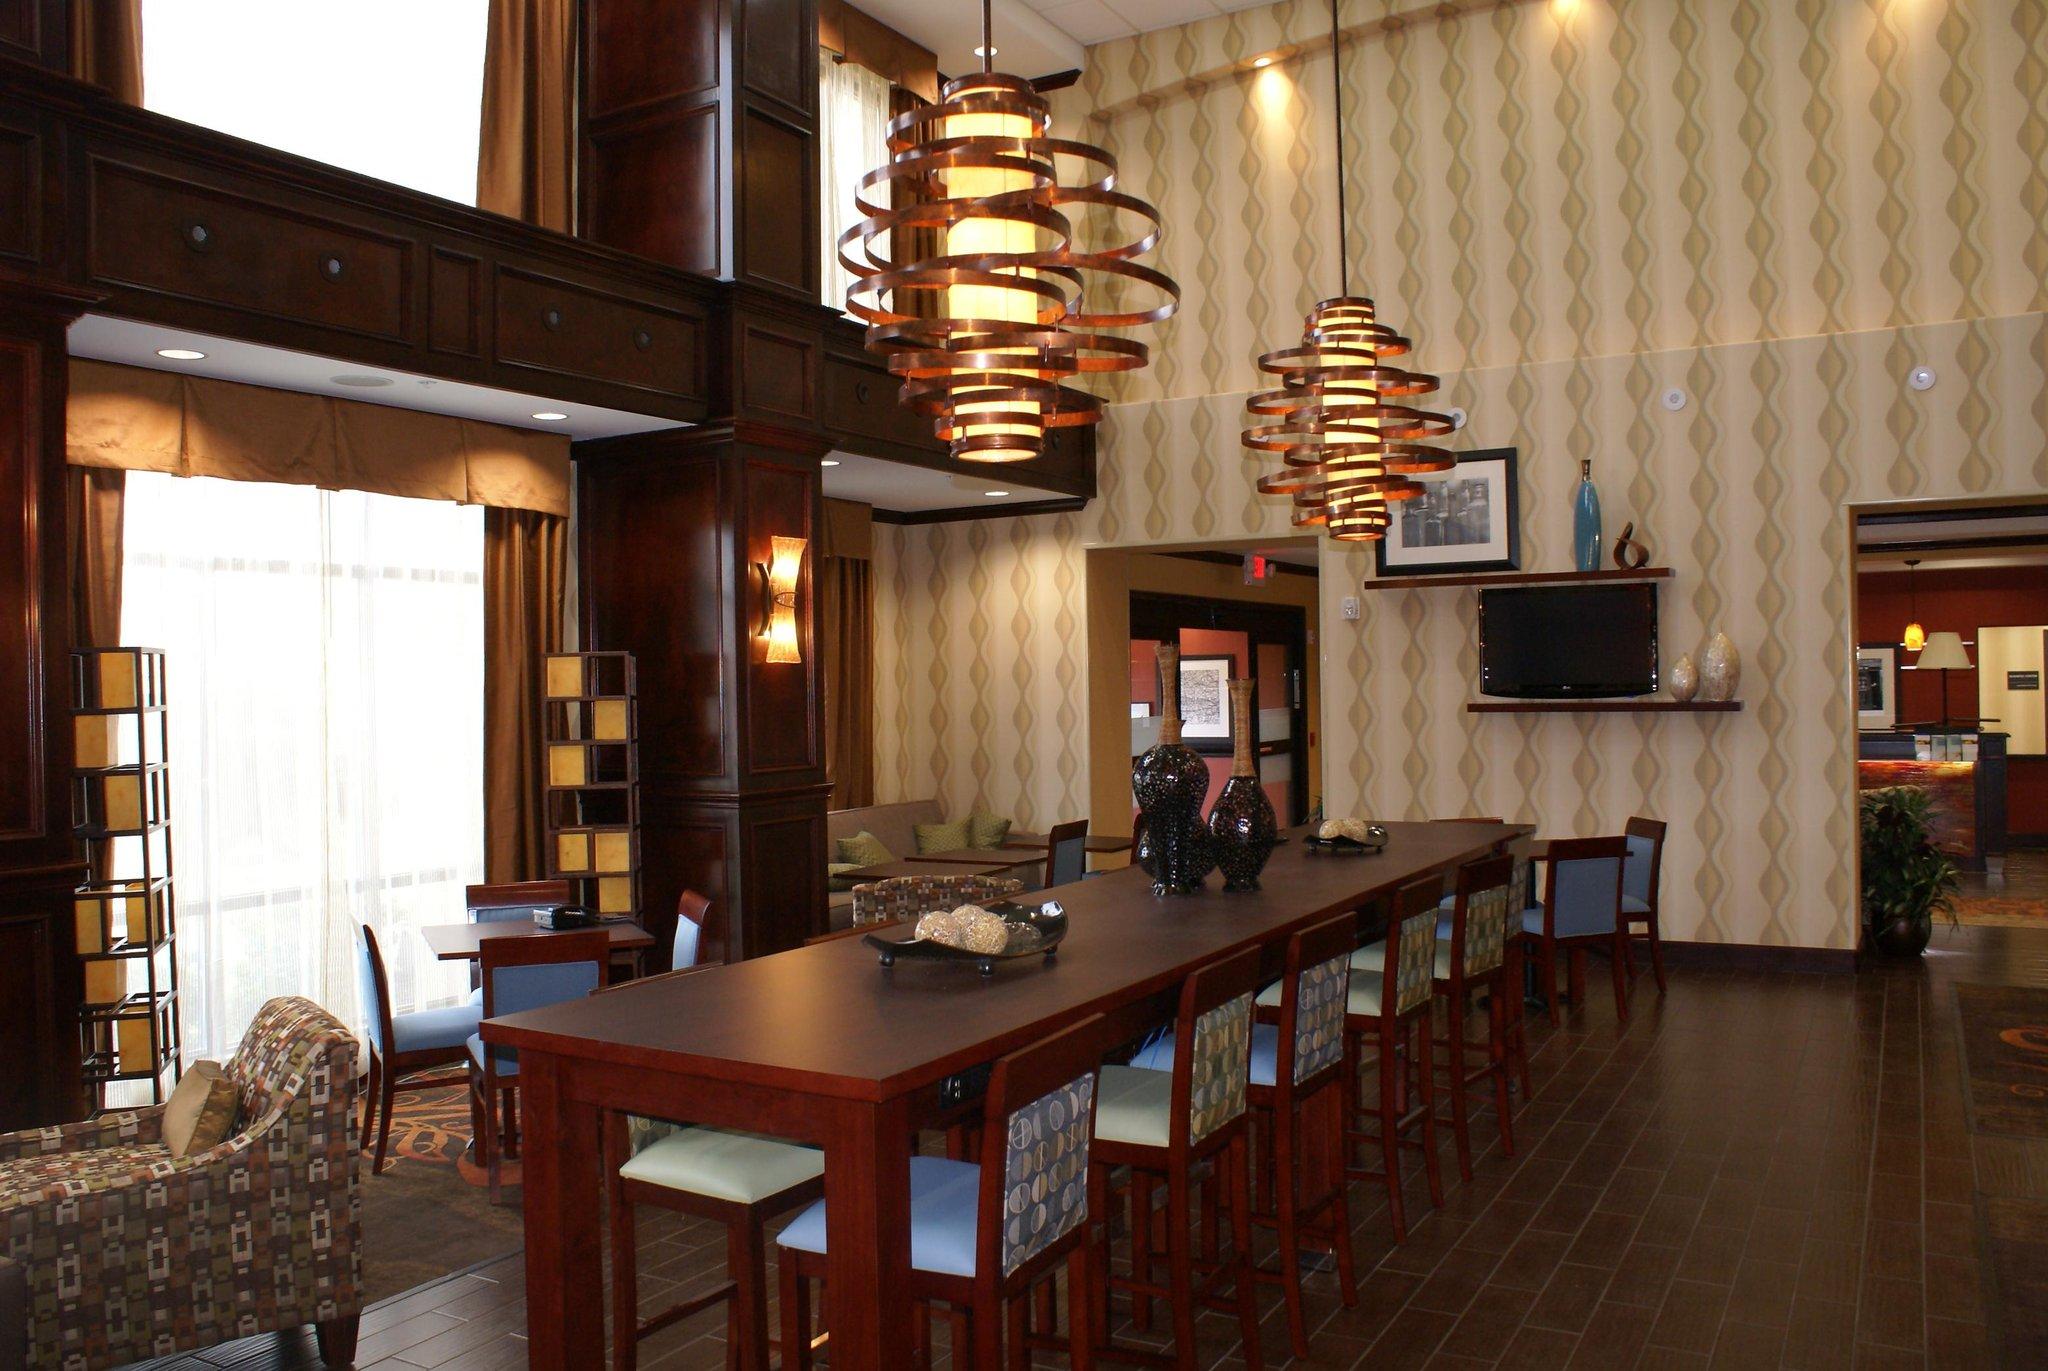 Hampton Inn and Suites Brenham, TX